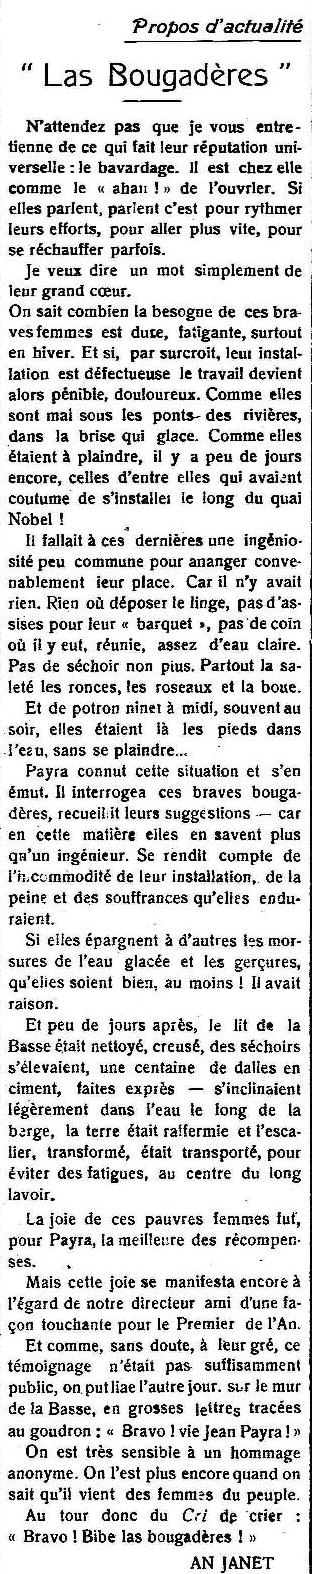 Le cri catalan 1929 26 01